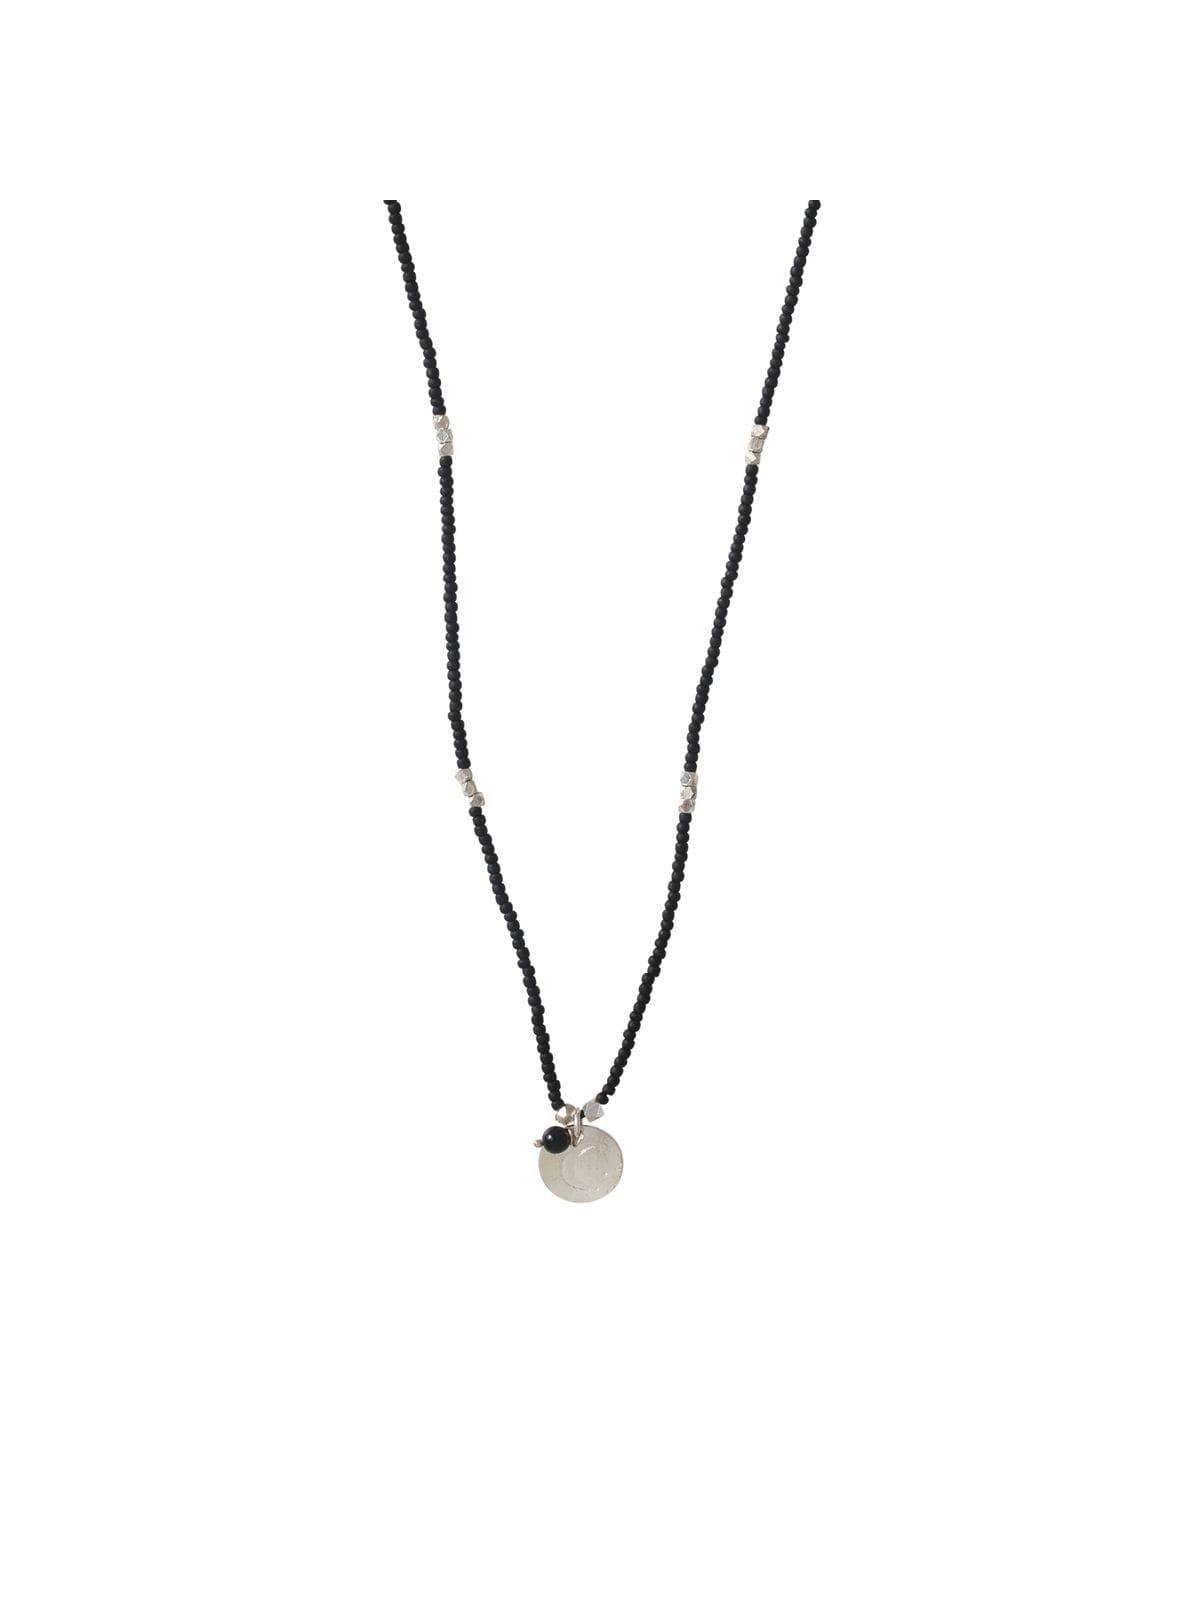 BL24970 - Truly Black Onyx Moon Silver Necklace_1_1200x1600